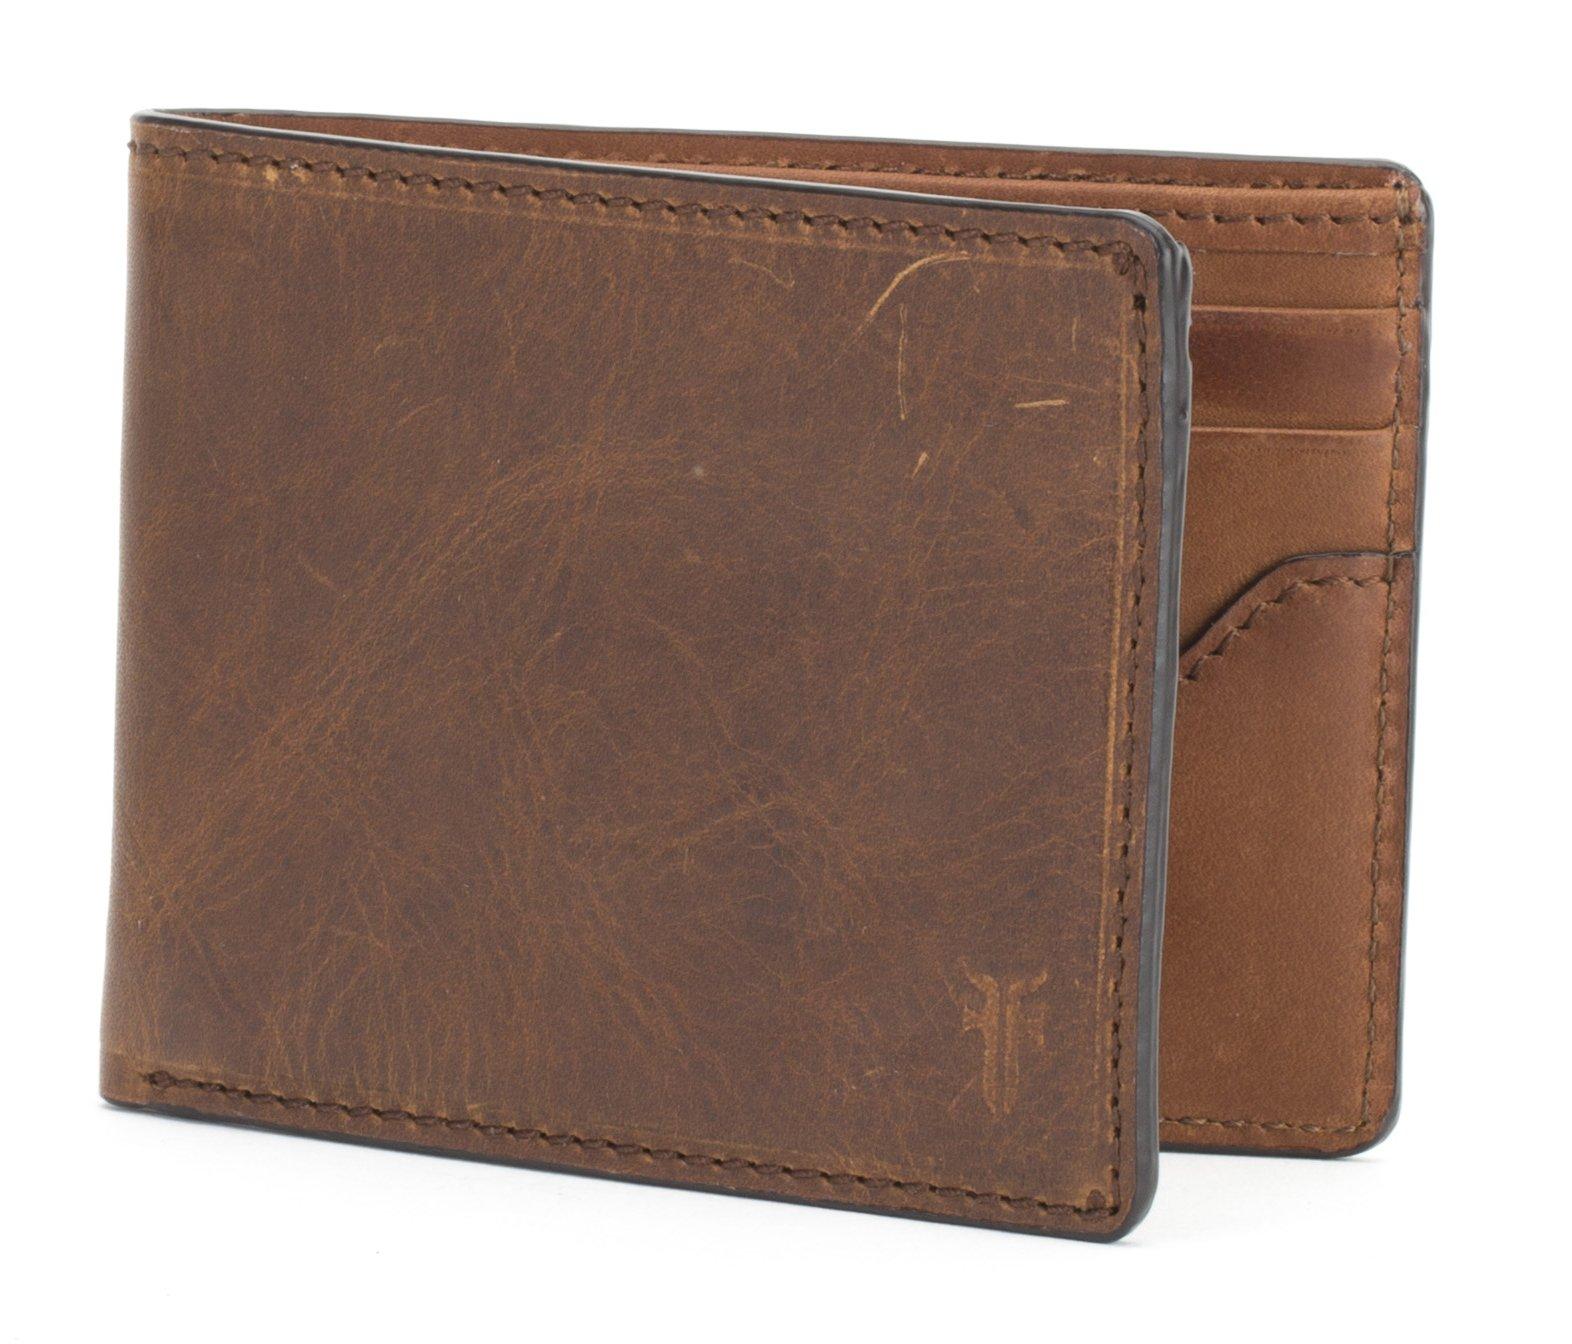 Logan Slim Id Billfold Wallet, cognac, One Size